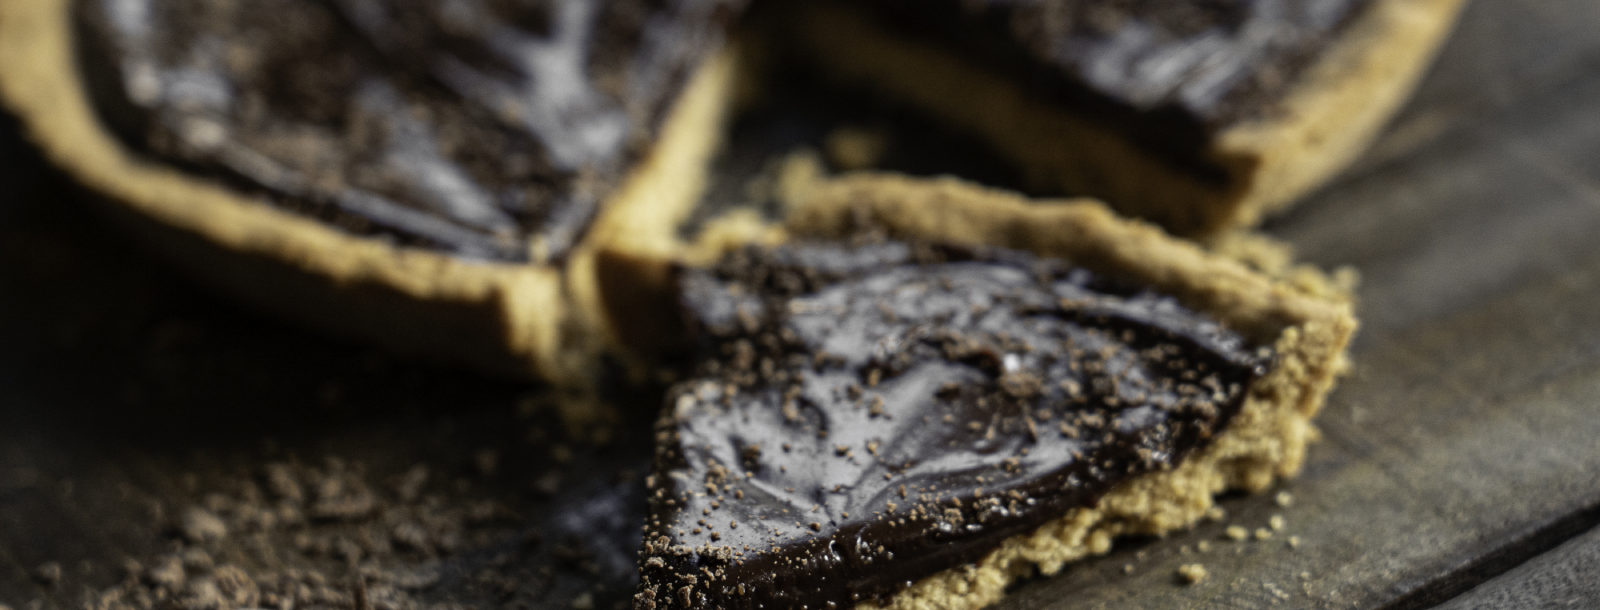 Tartelette-chocolat_la Perruche